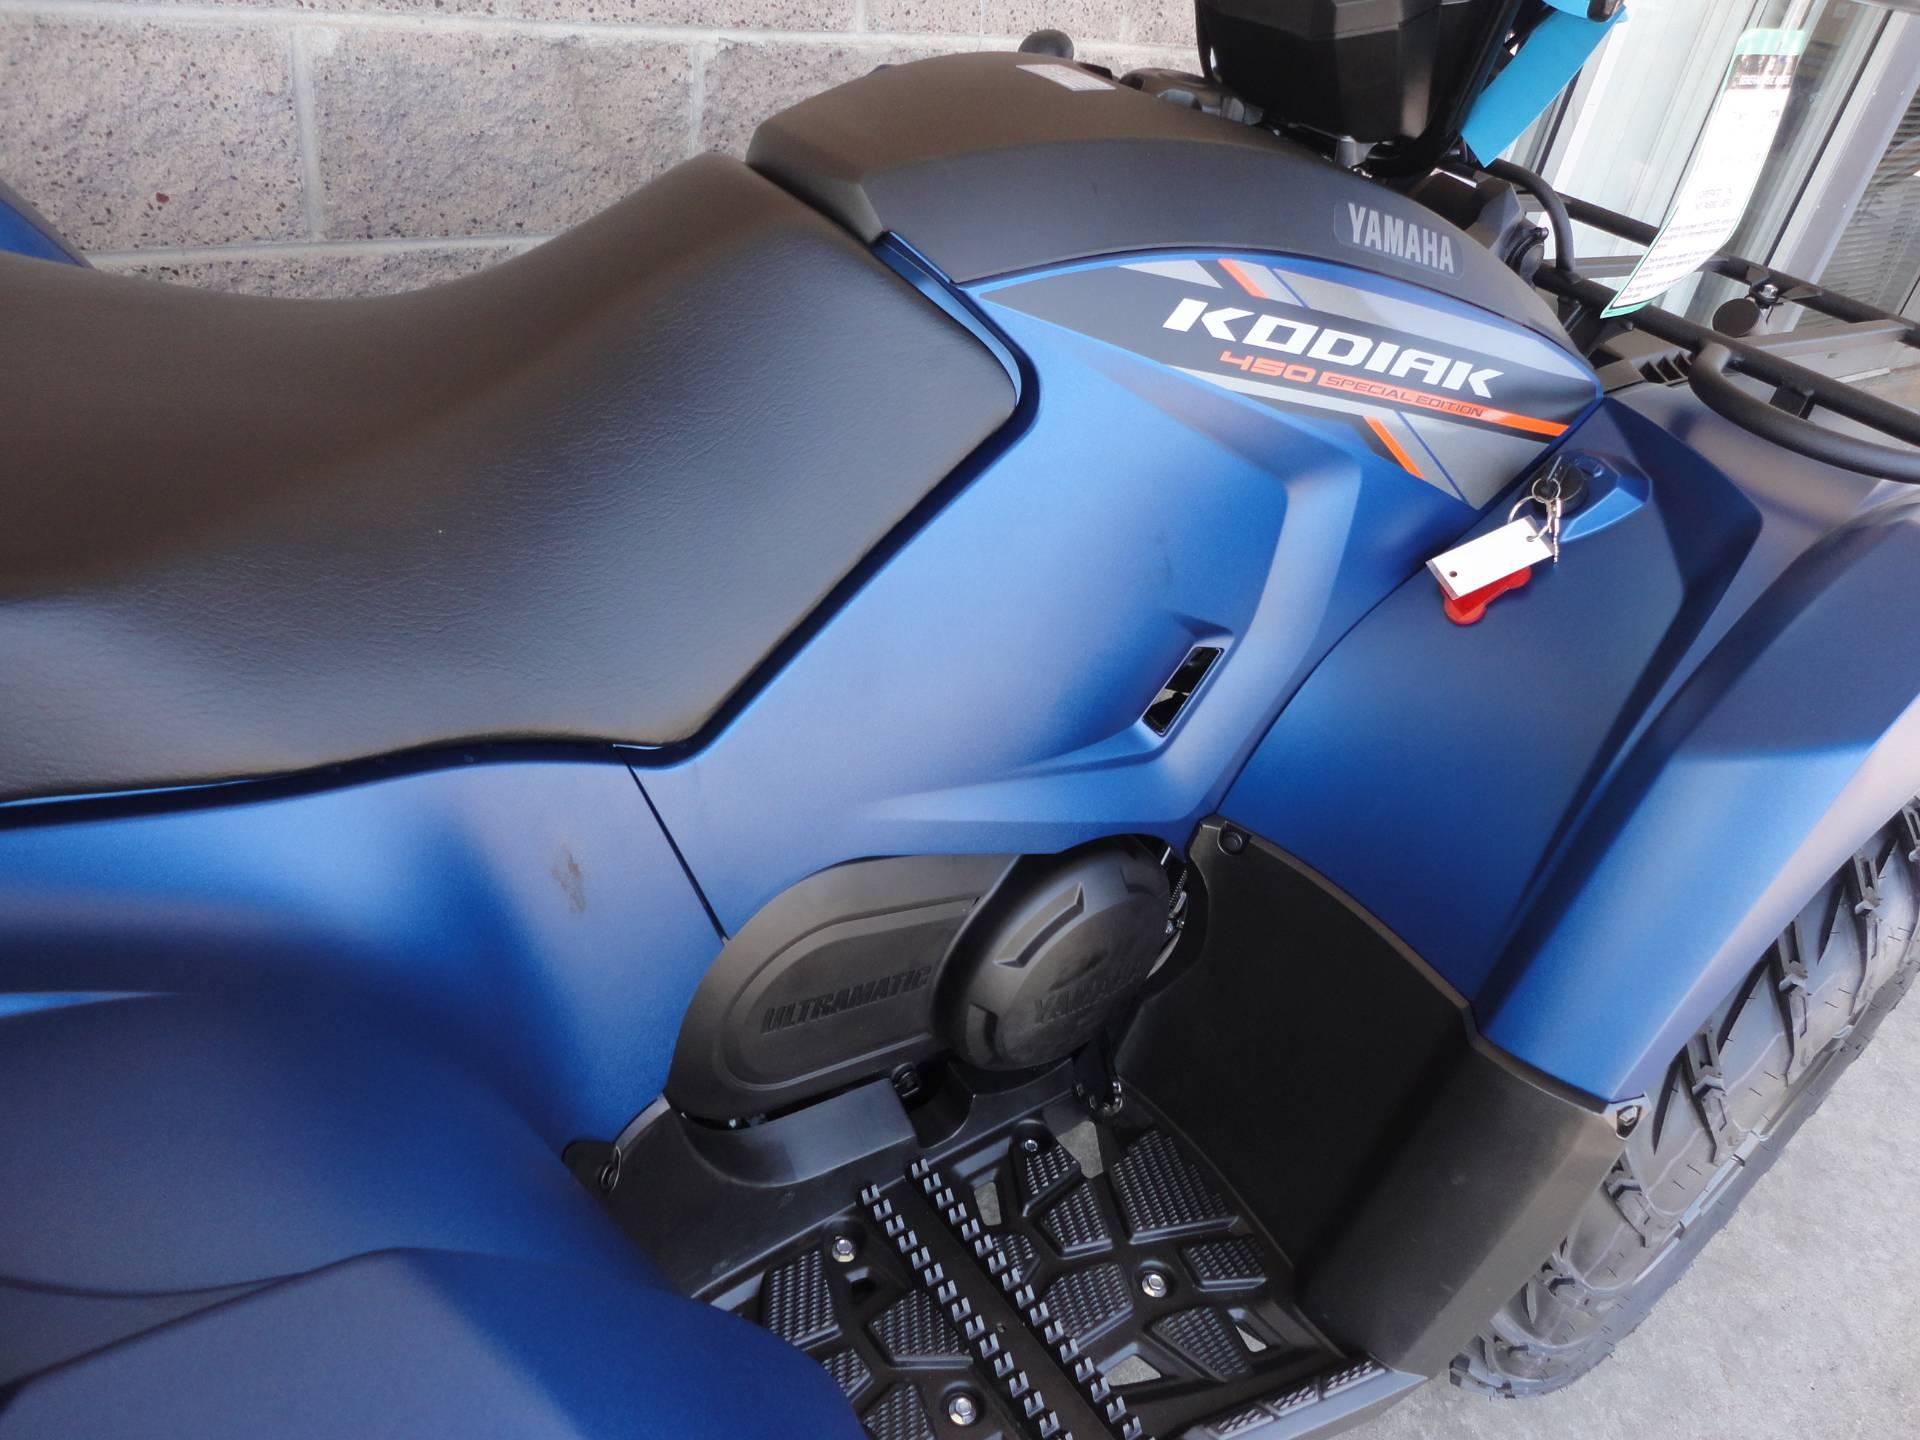 Yamaha Kodiak 450 Winch Wiring Diagram 2019 Eps Se Atvs Denver Colorado V0630 In